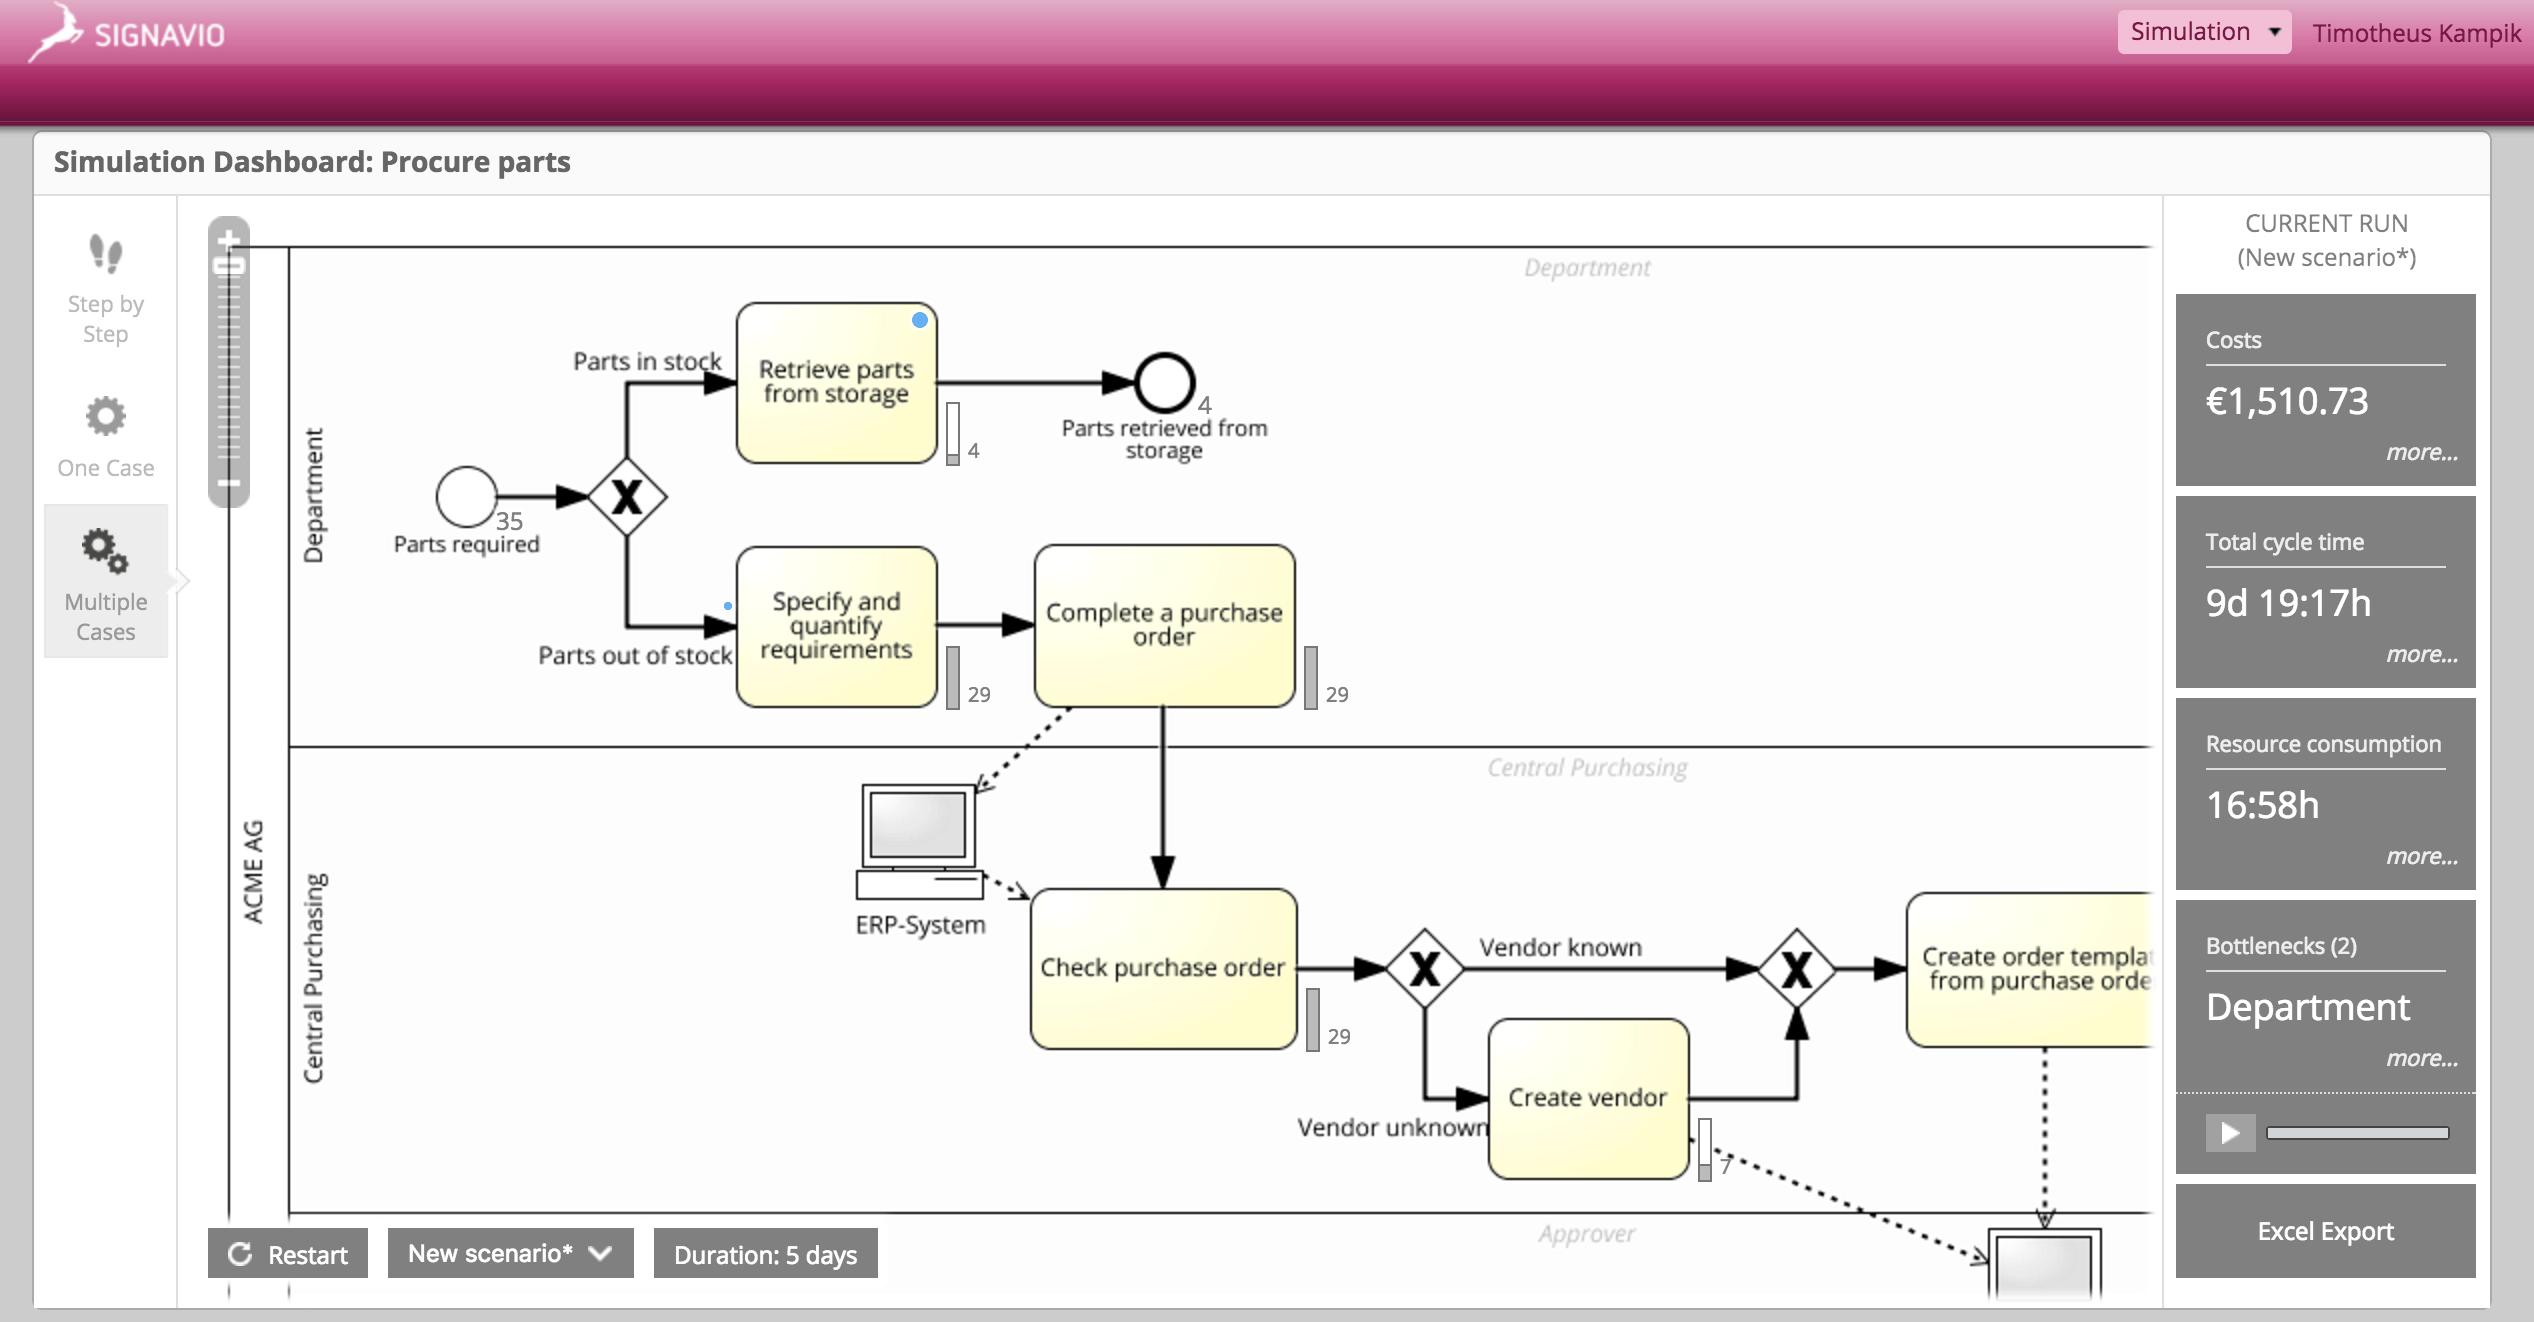 BPM Simulation Dashboard Screenshot before Redesign